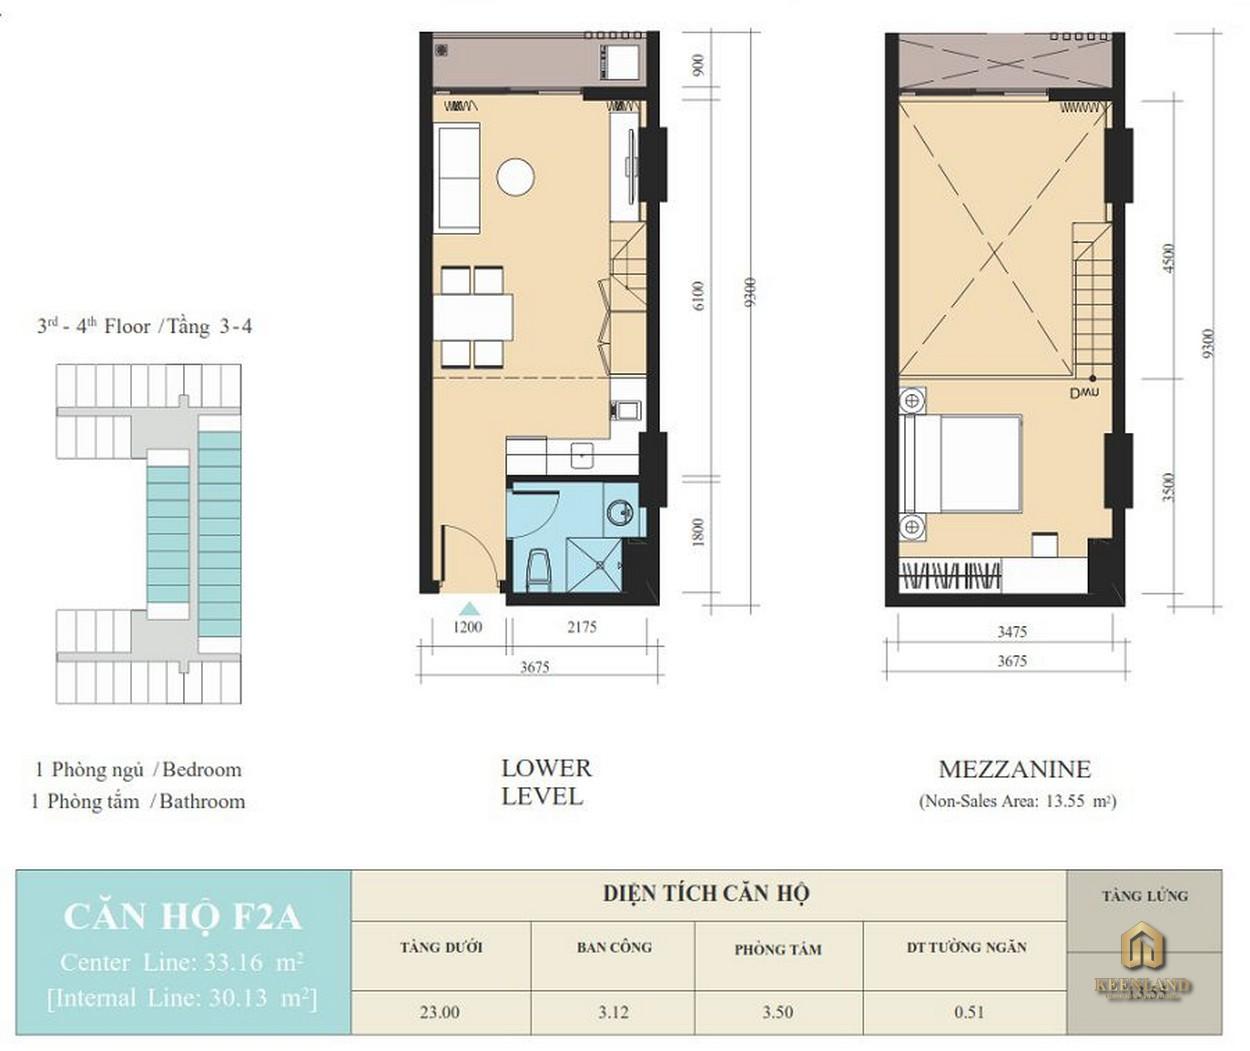 Thiết kế căn hộ F2A